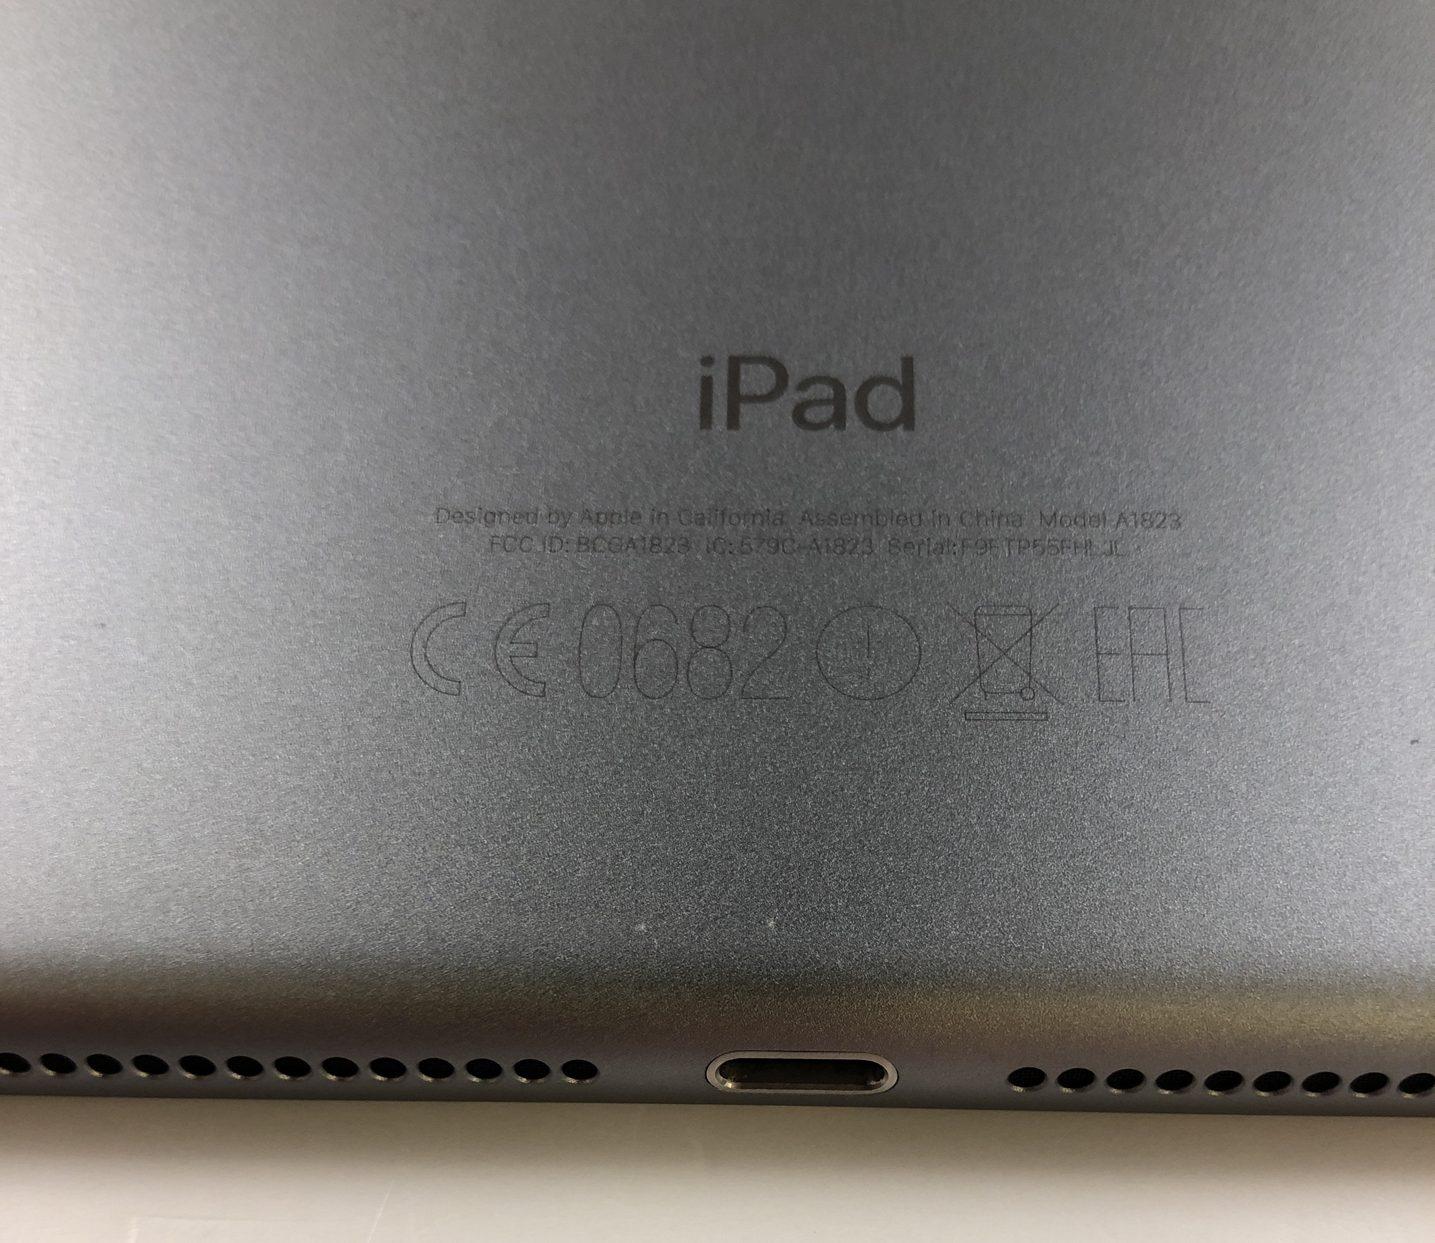 iPad 5 Wi-Fi + Cellular 128GB, 128GB, Space Gray, bild 3